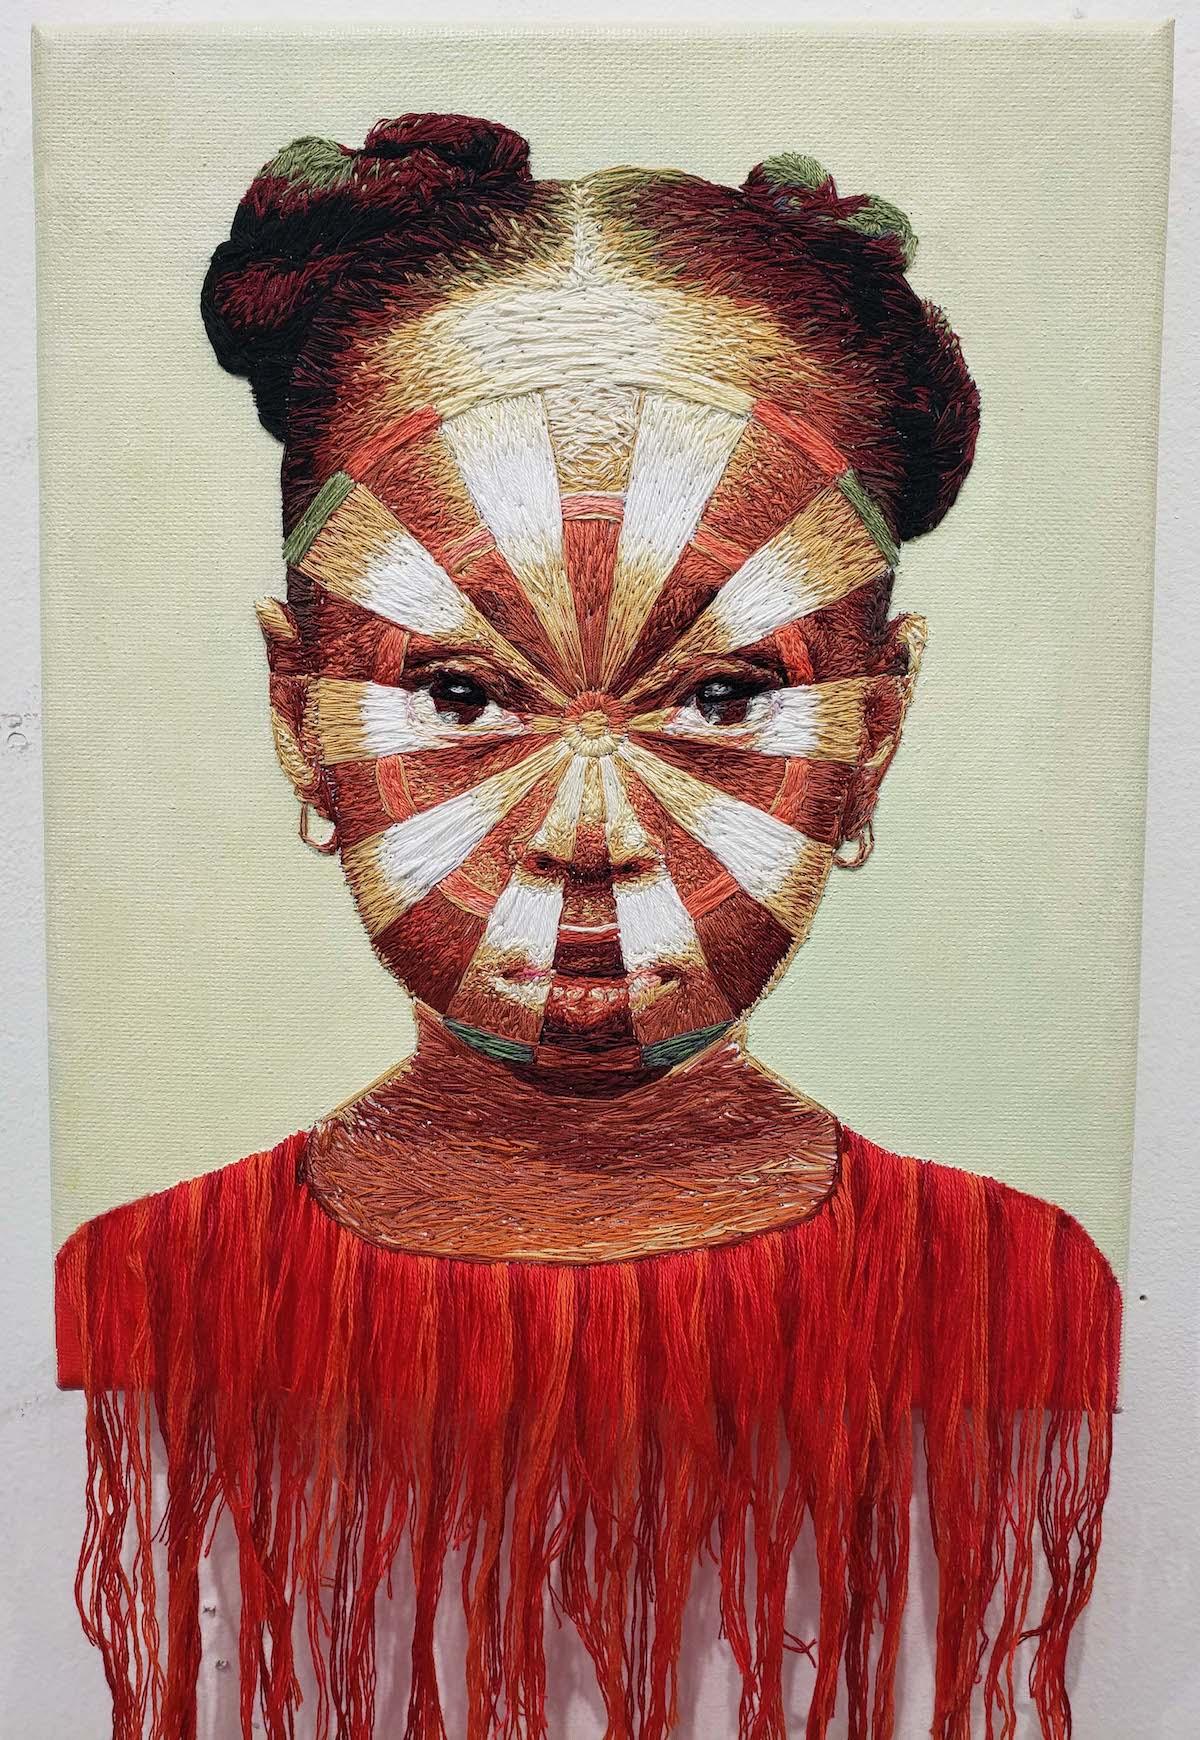 Mixed Media Portrait of a Black Girl by Nneka Jones